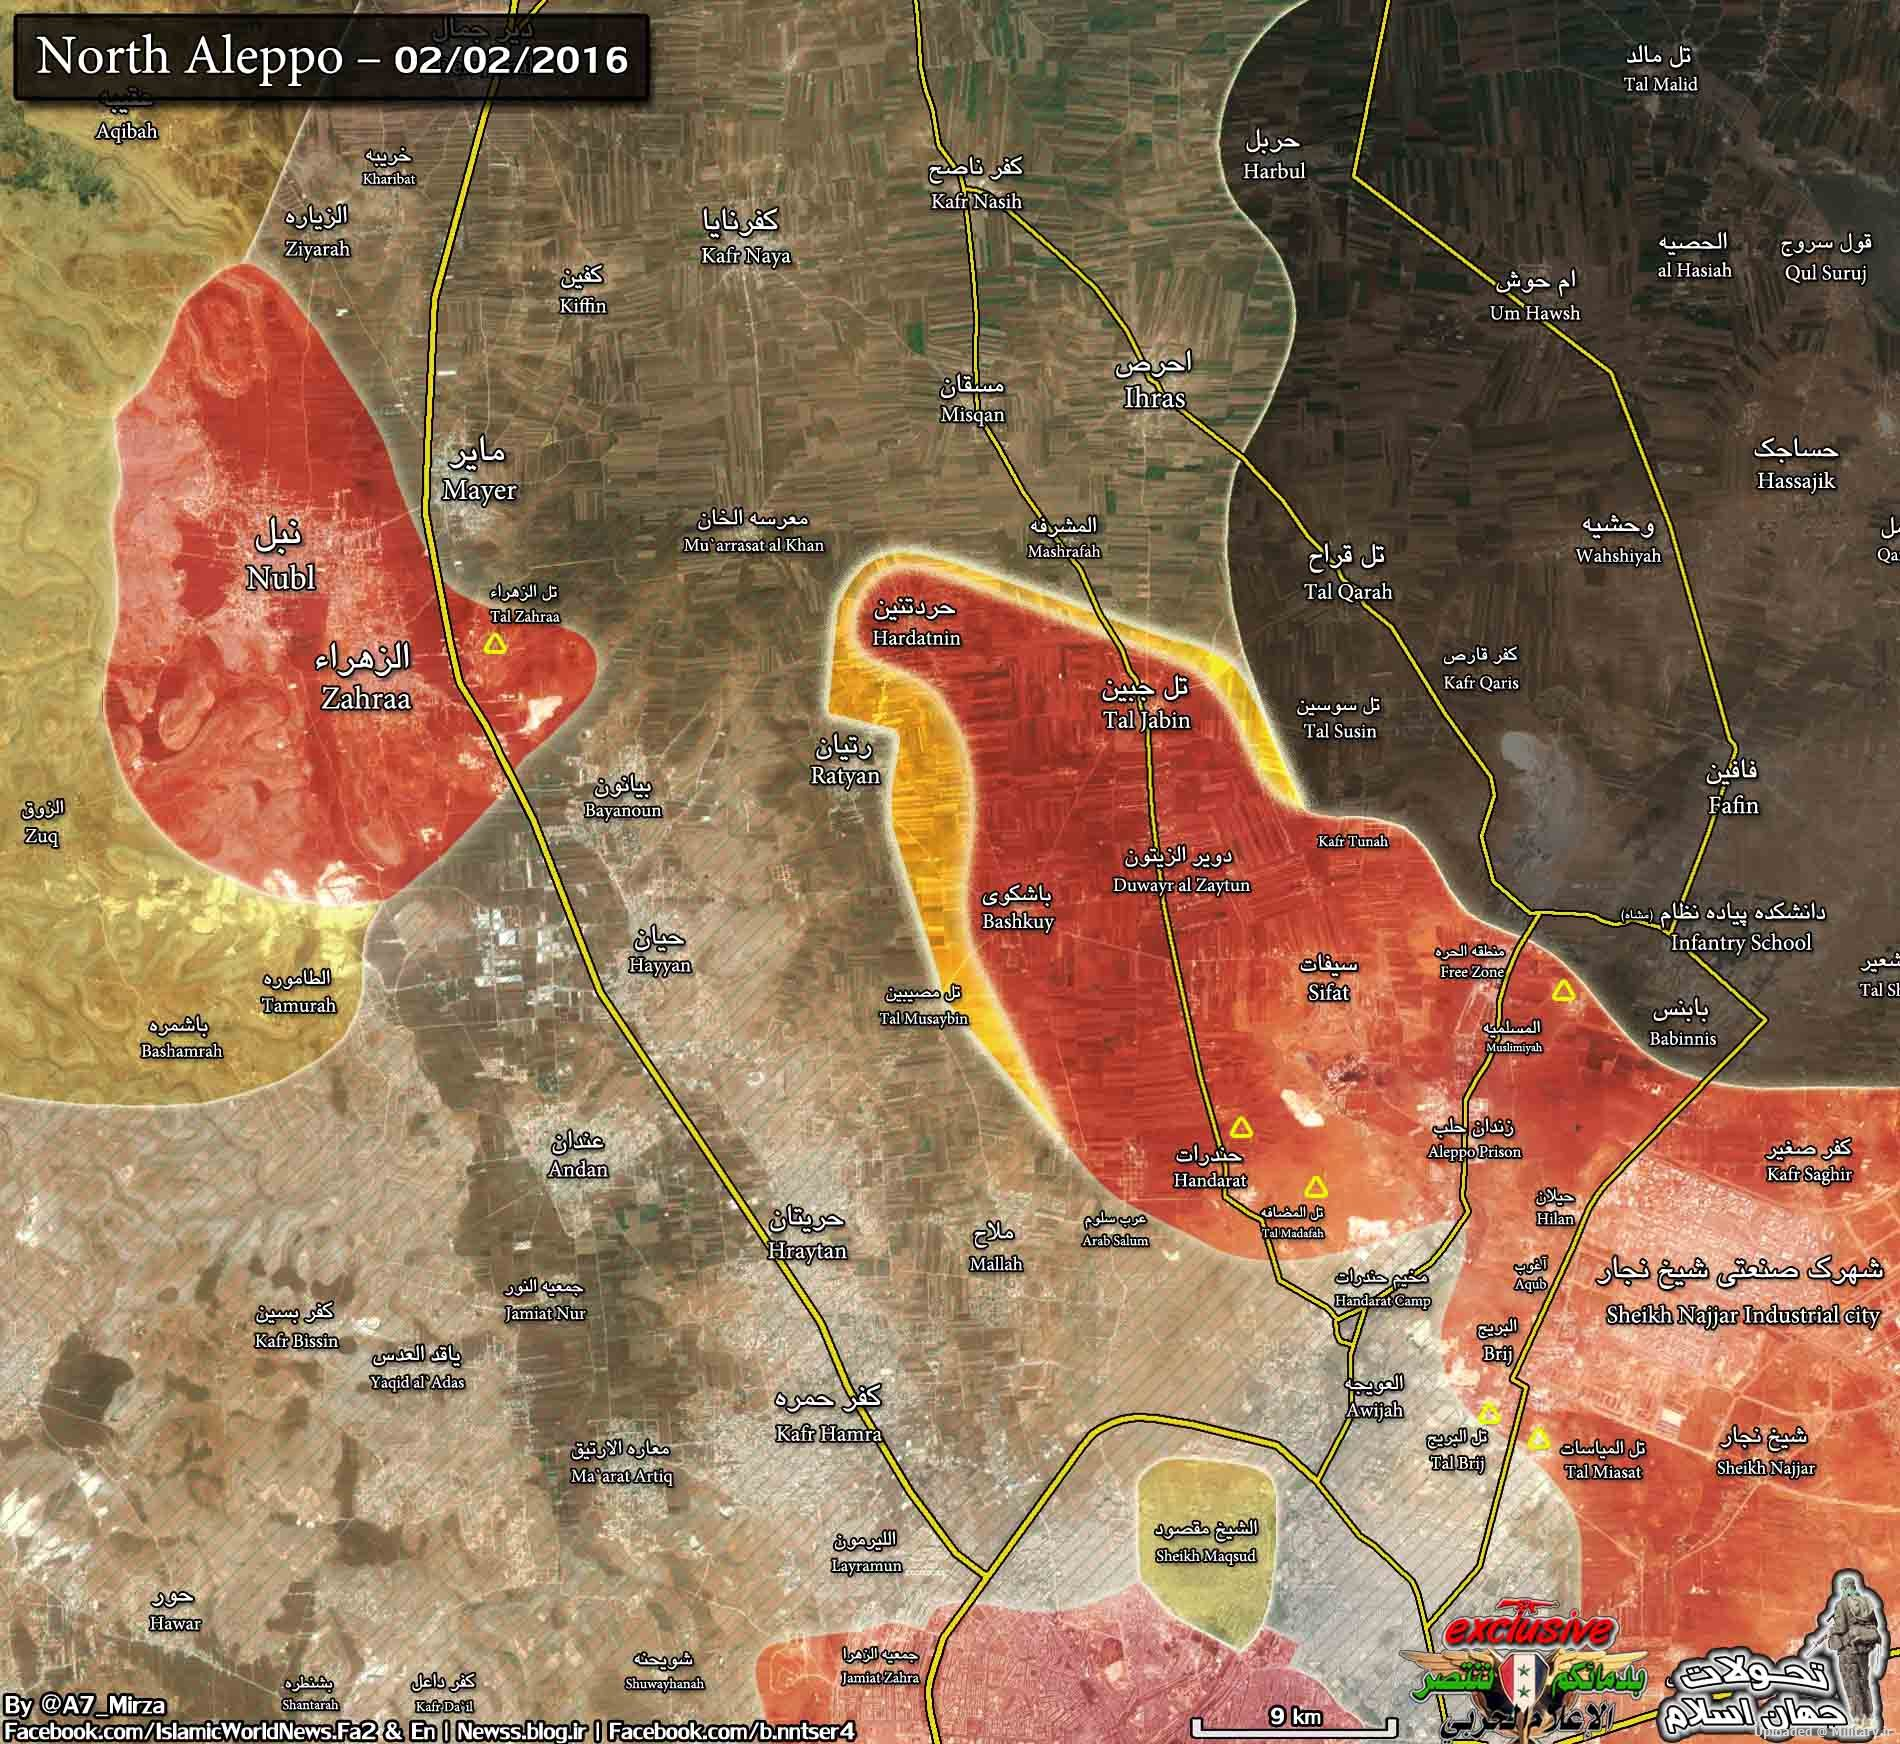 North_Aleppo_9km_cut1_2feb_13bahman_low.